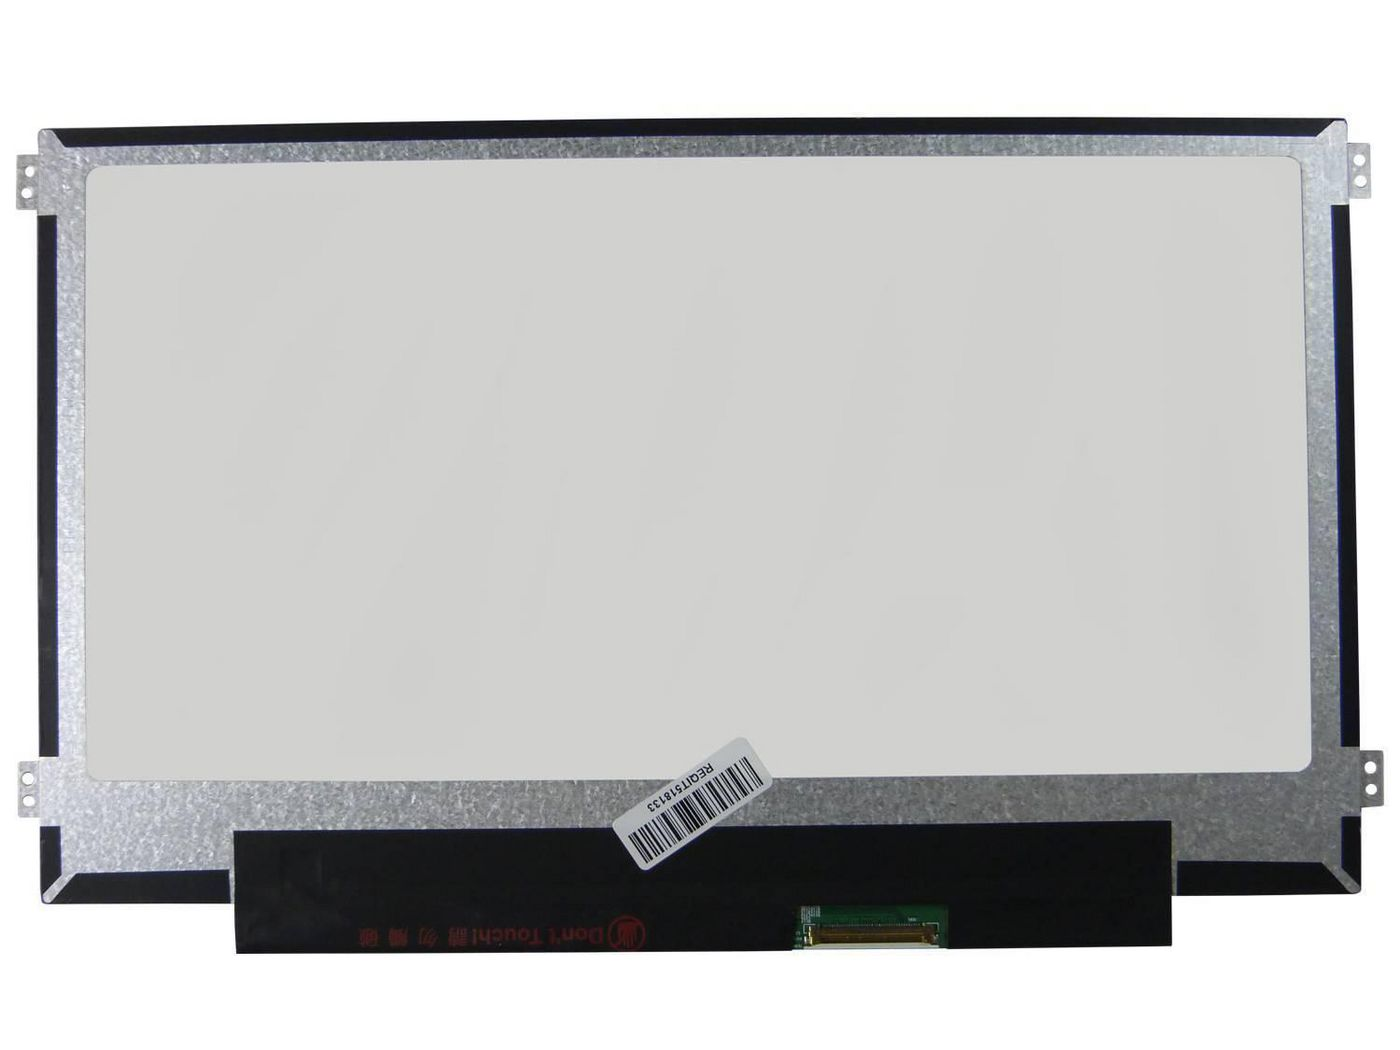 CoreParts MSC116H40-210G 11,6 LCD HD Glossy